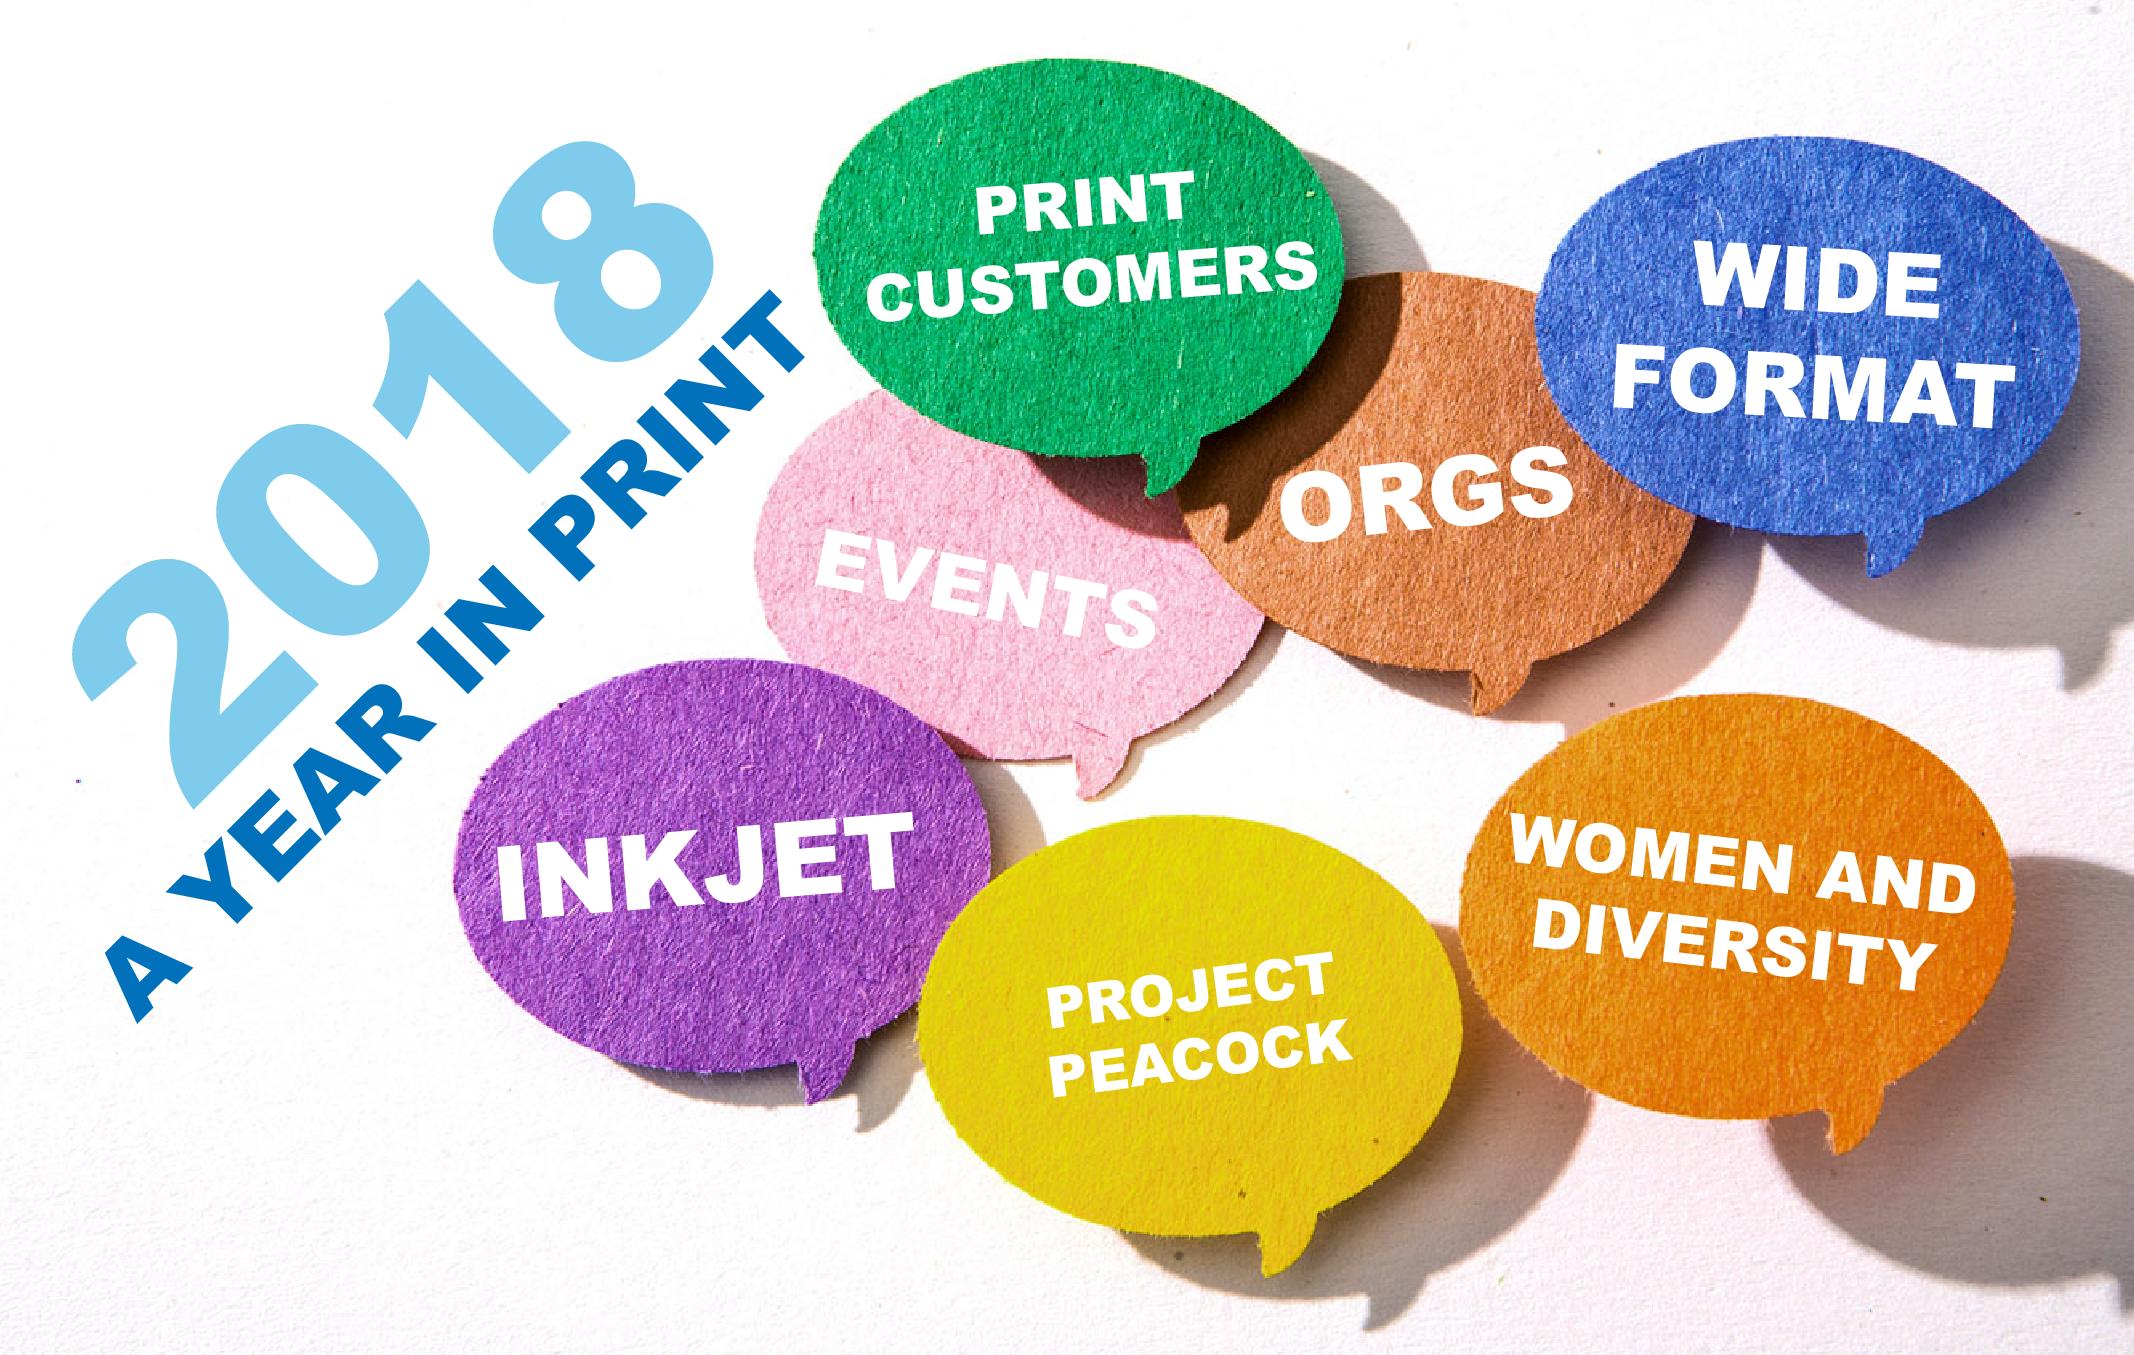 2018 year in print - print media centr